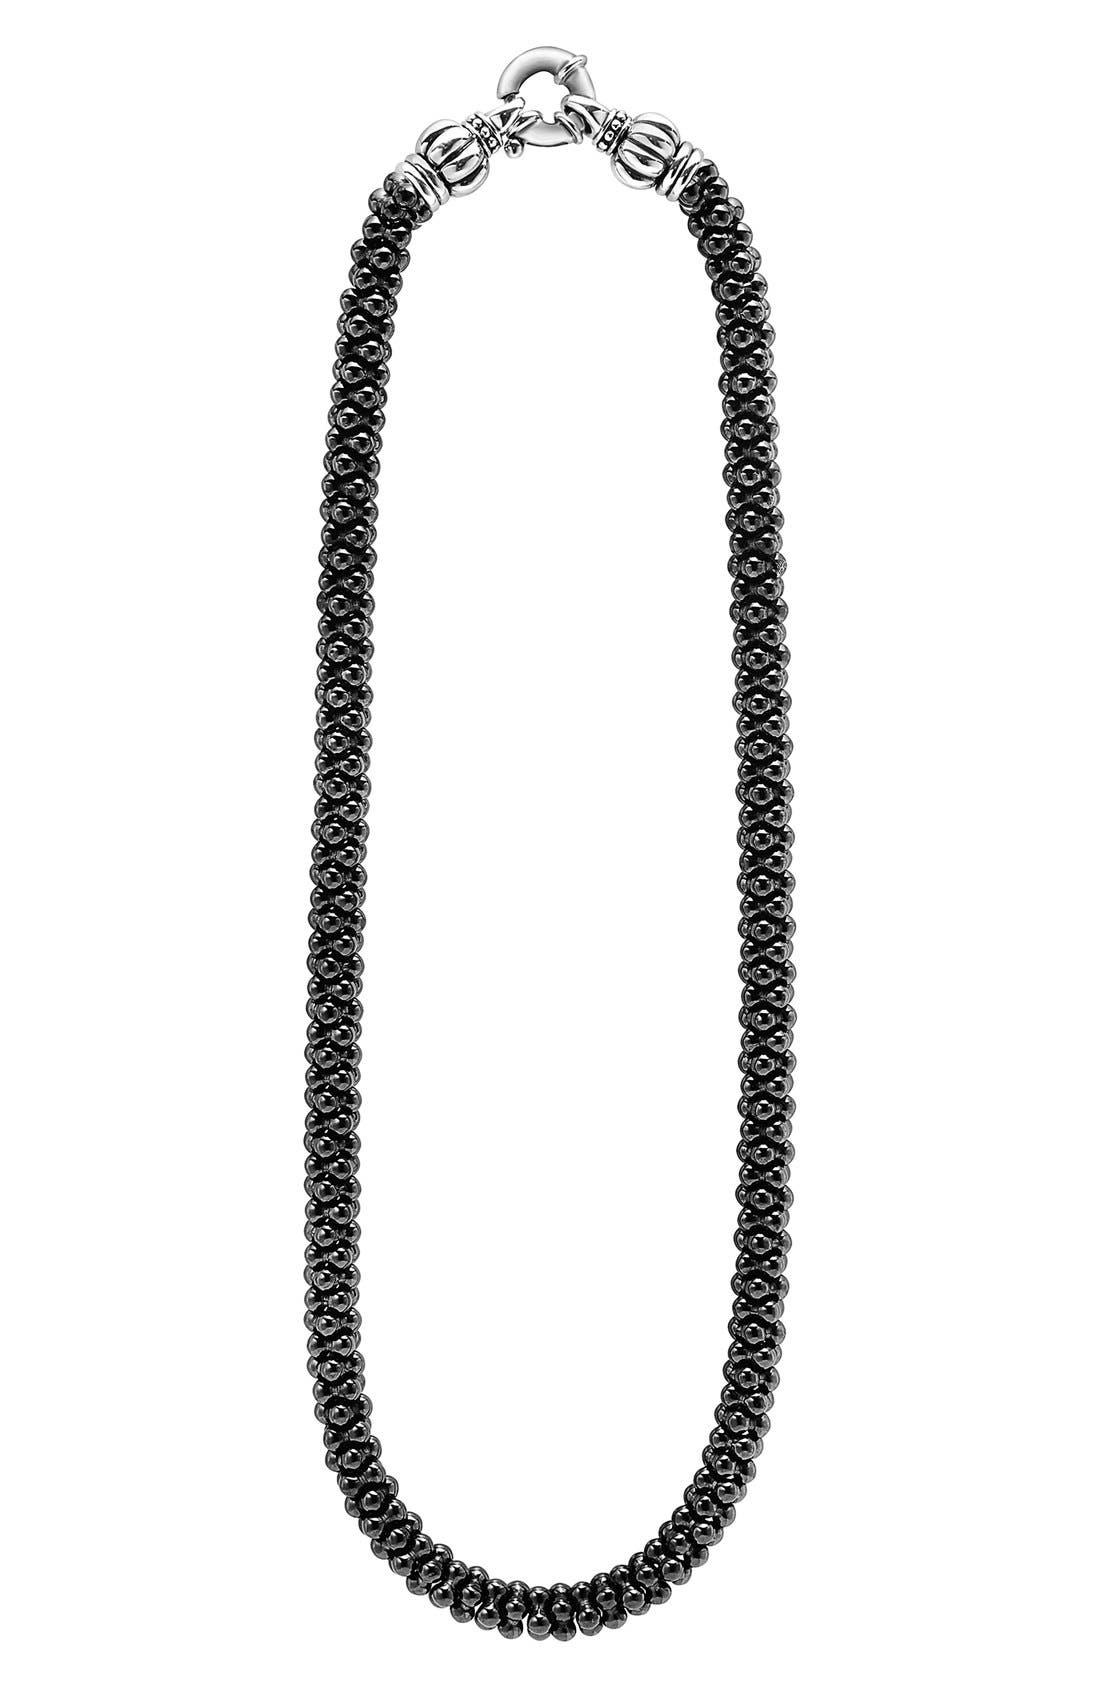 Main Image - LAGOS 'Black Caviar' 7mm Beaded Necklace